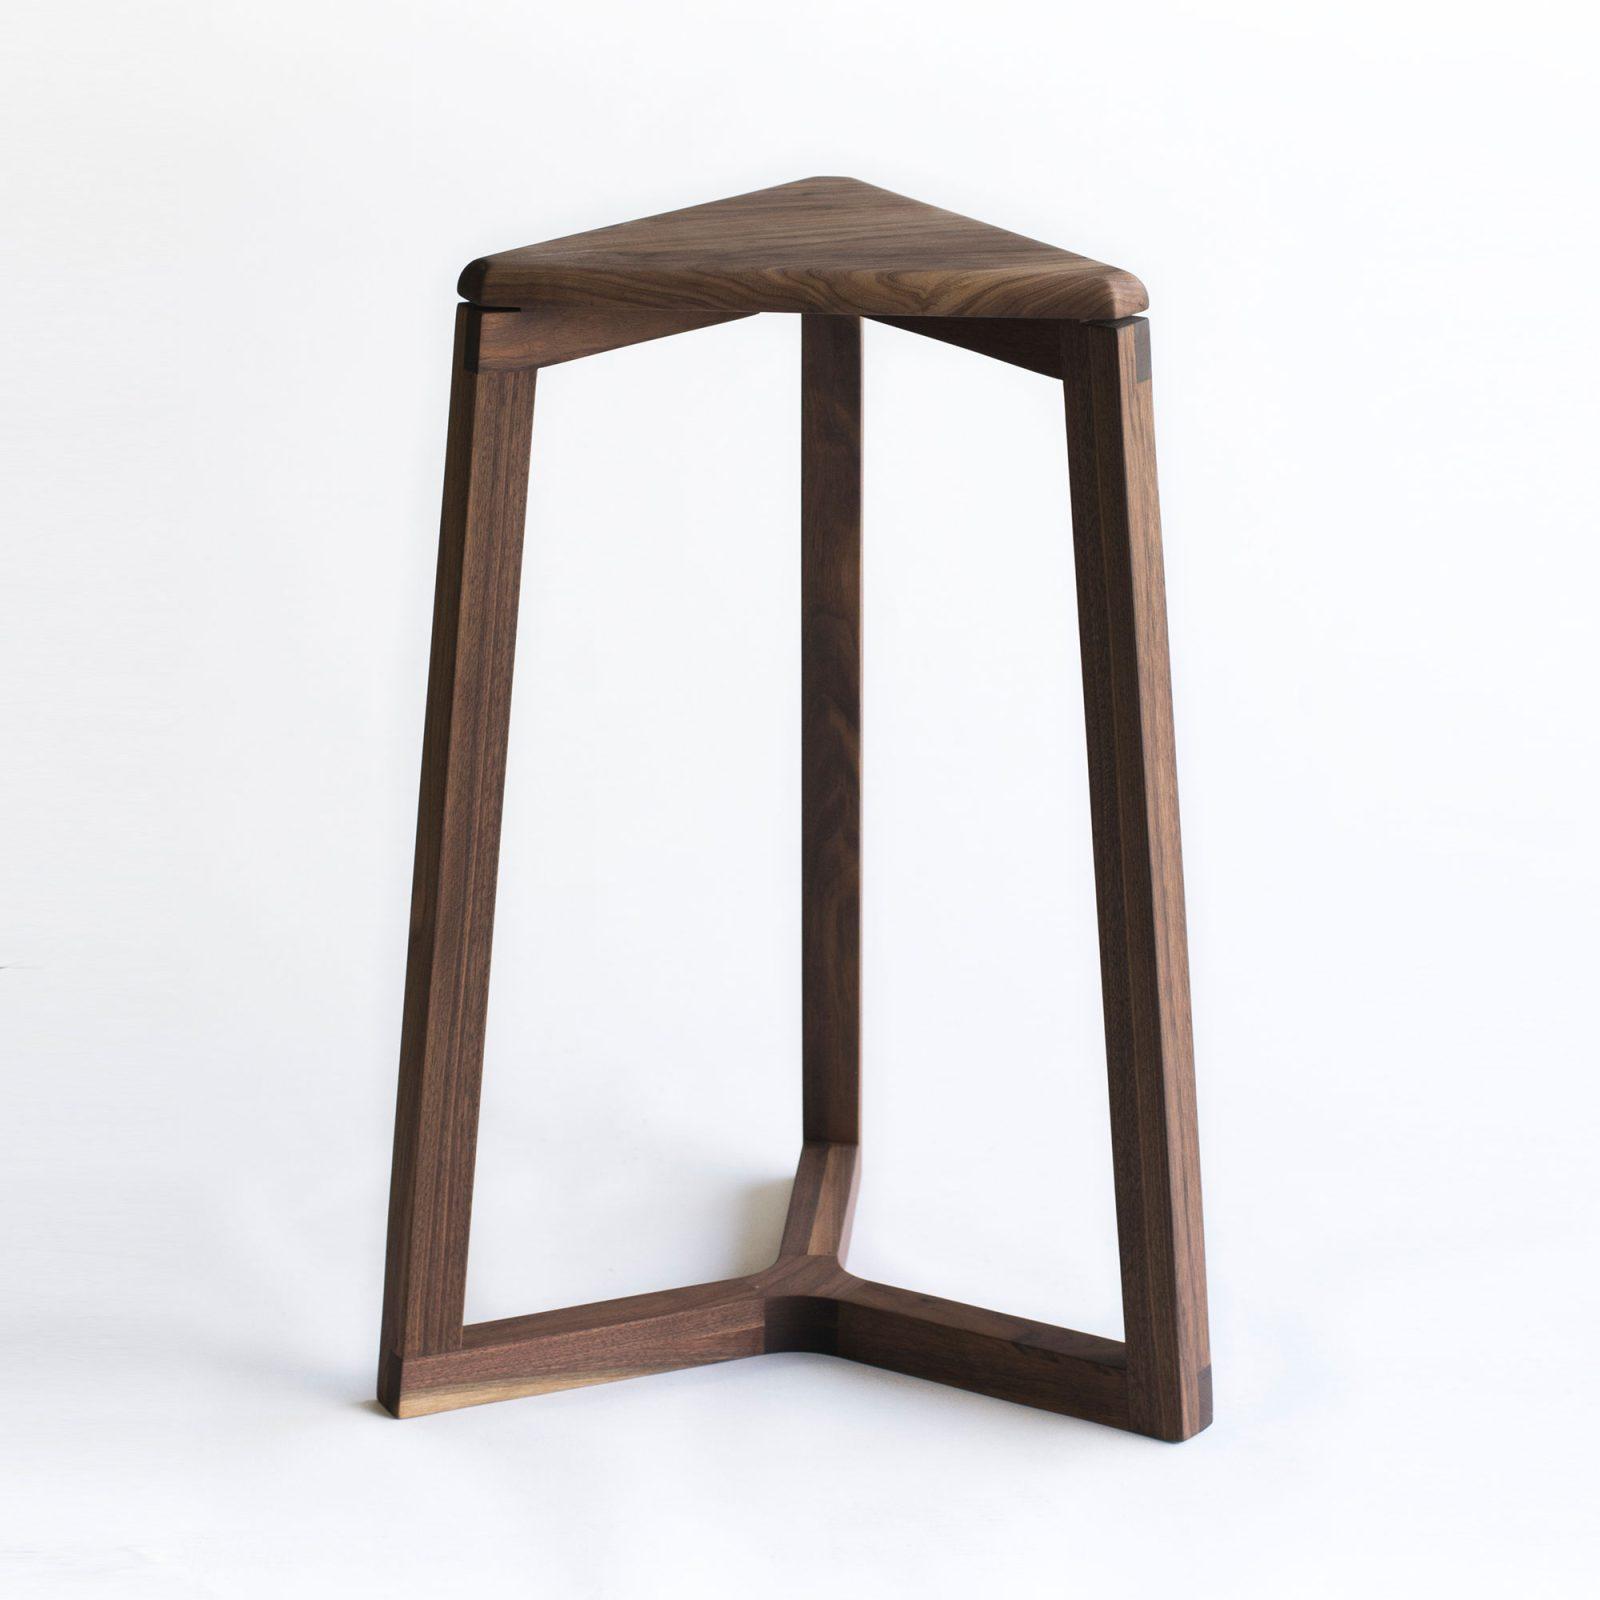 walnut-kitchen-stool-2